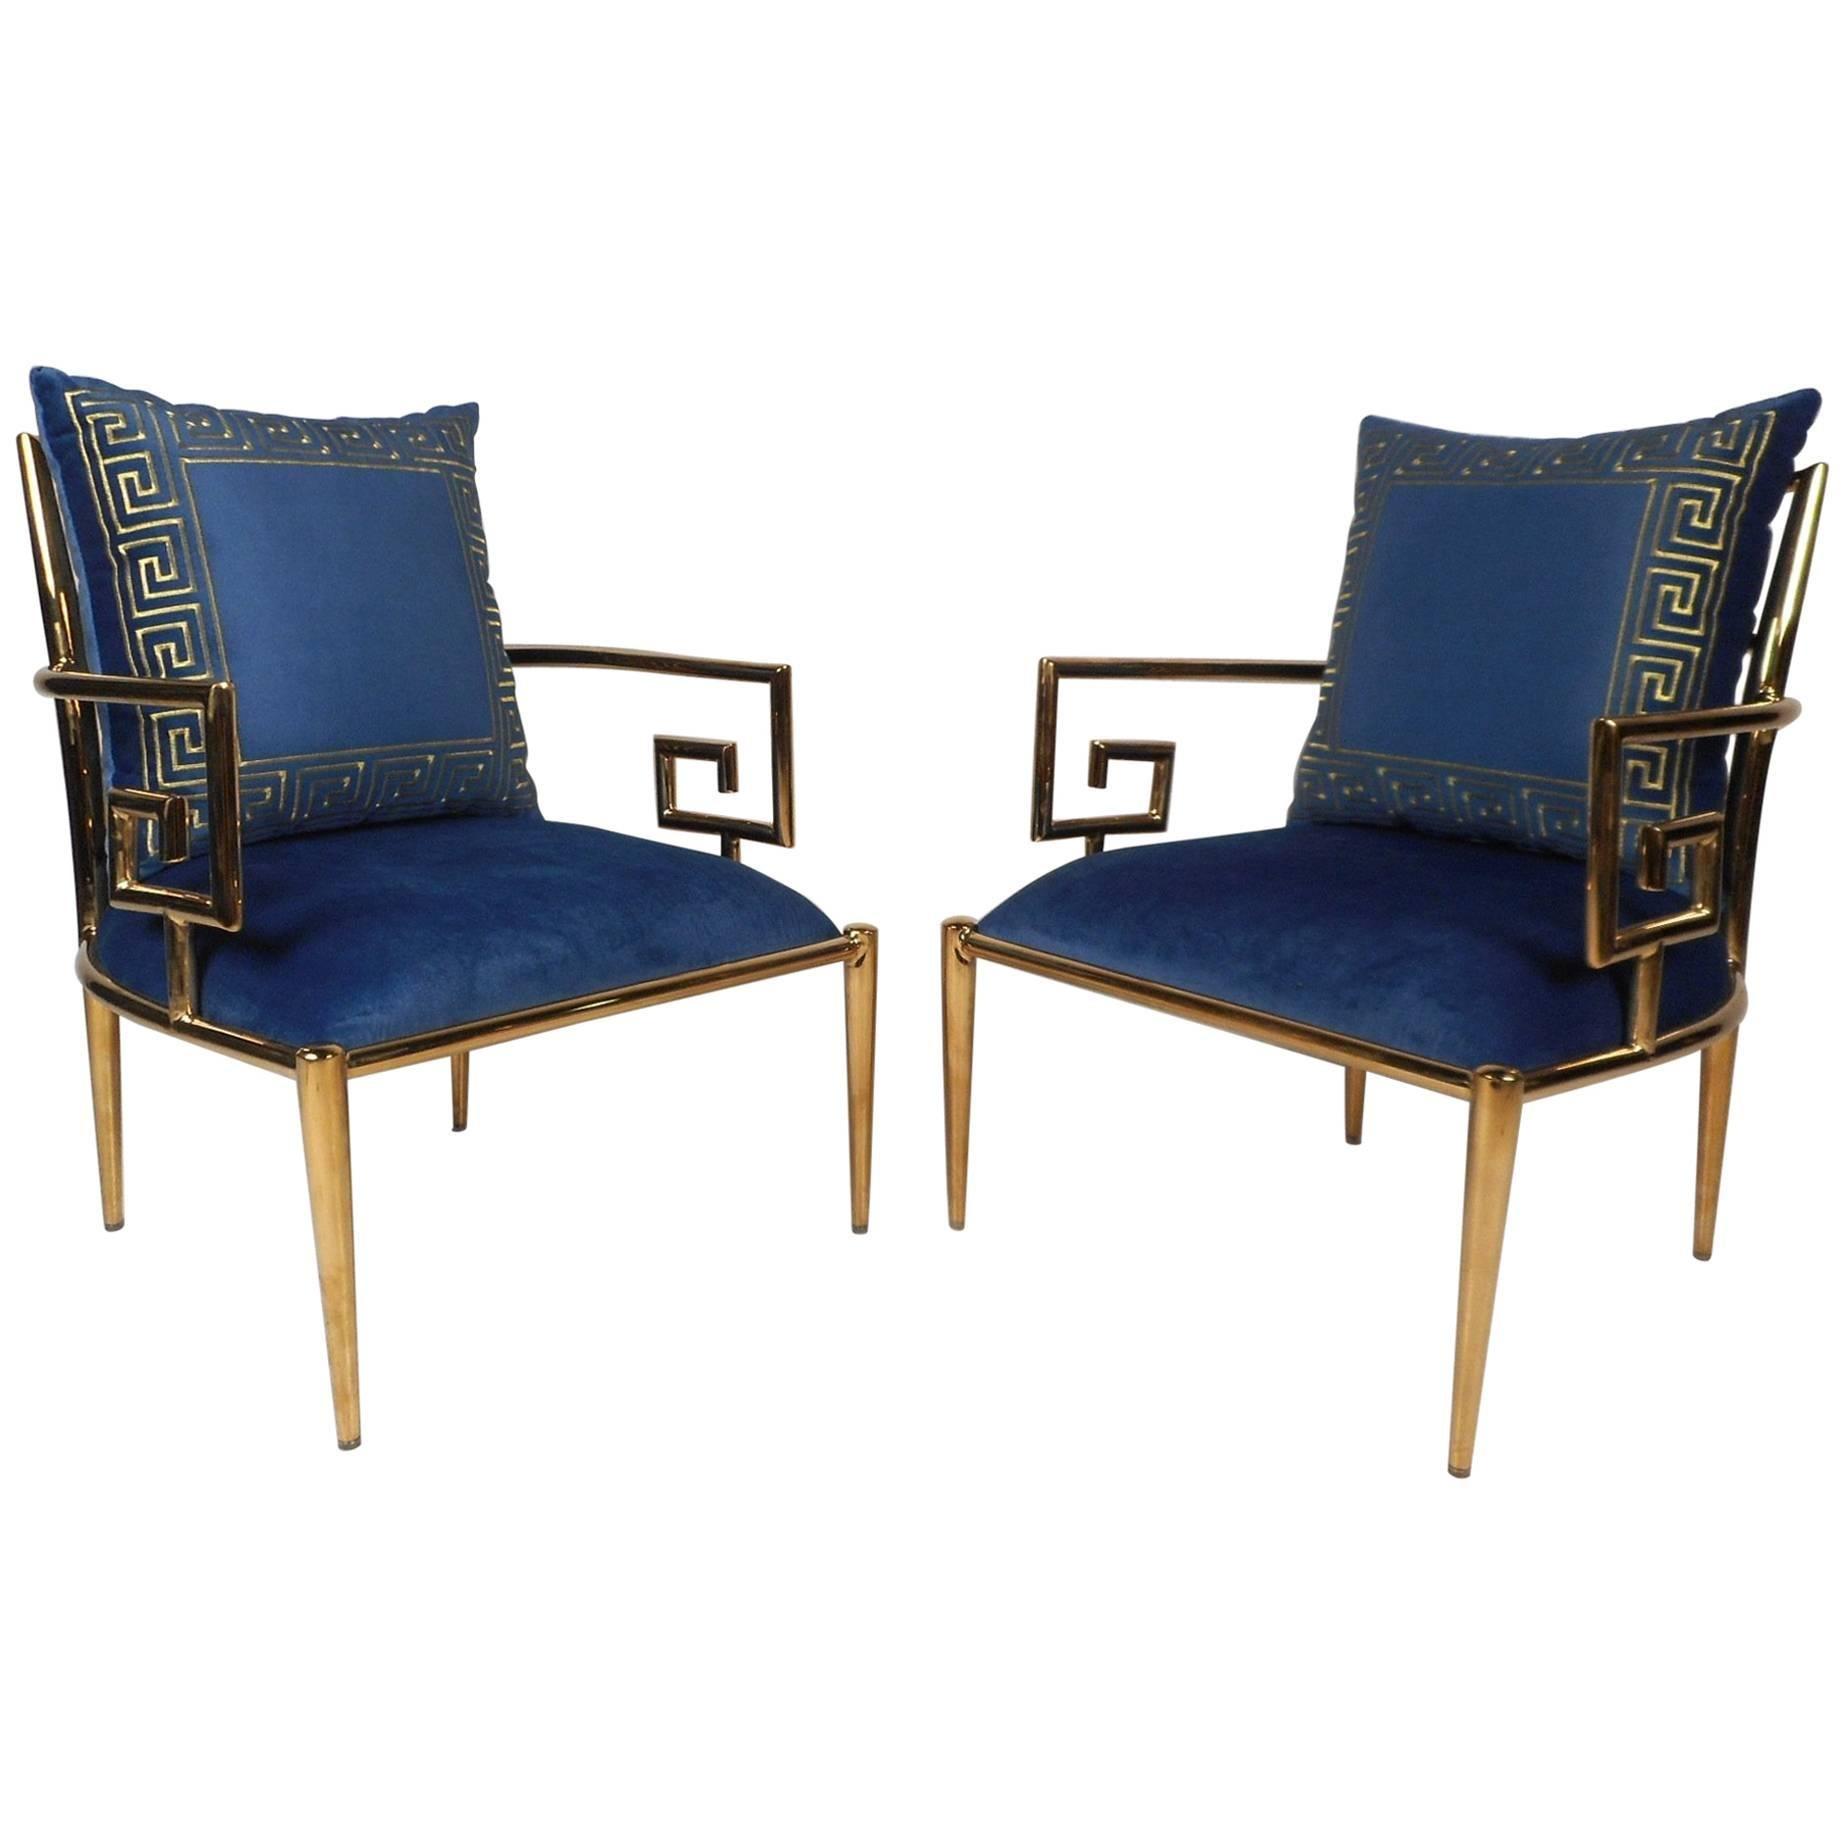 Elegant Pair of Mid-Century Modern Lounge Chairs